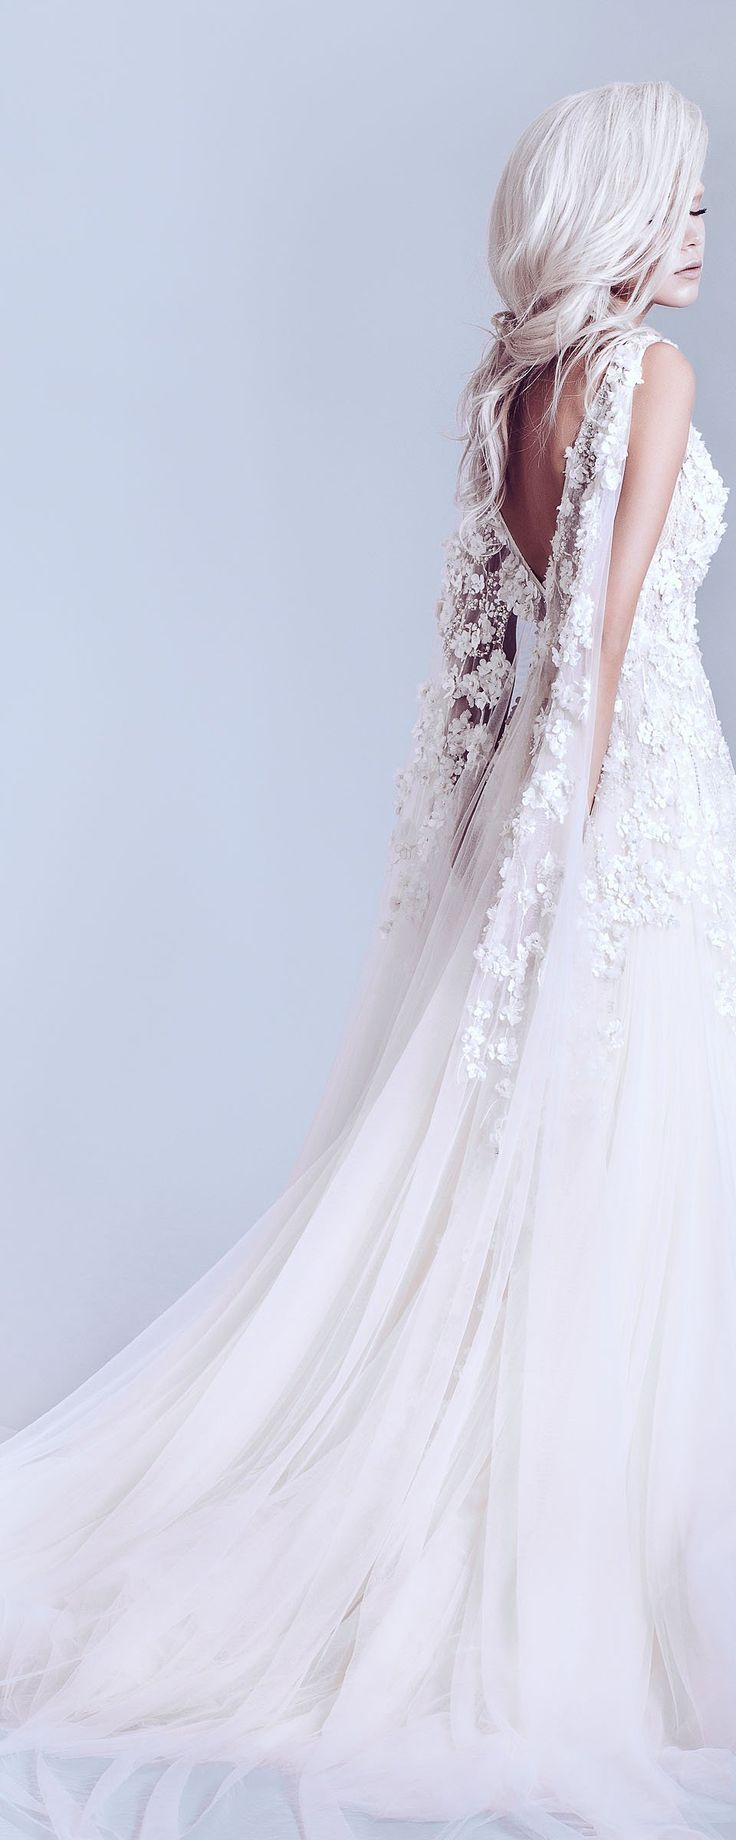 Alfazairy İlkbahar-Yaz 2015 - Haute couture - http://tr.orientpalms.com/alfazairy-5347